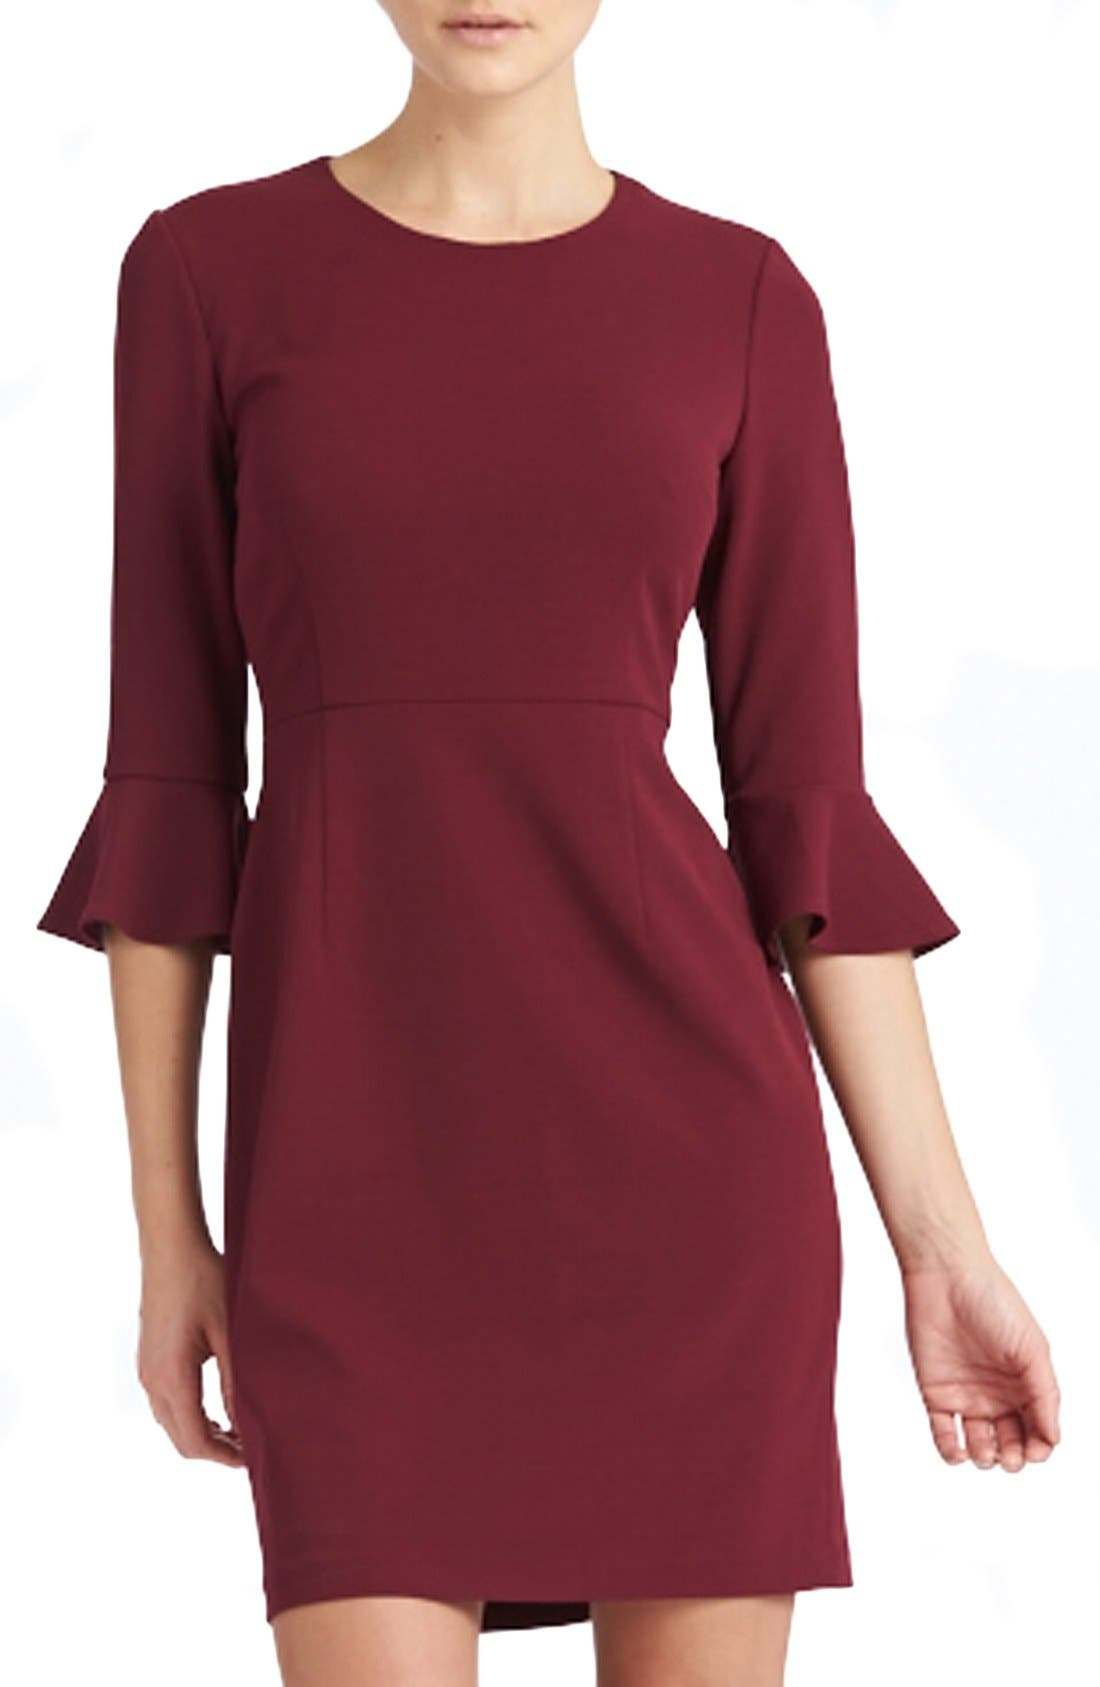 Alternate Image 1 Selected - Donna Morgan Belle Sleeve Crepe Sheath Dress